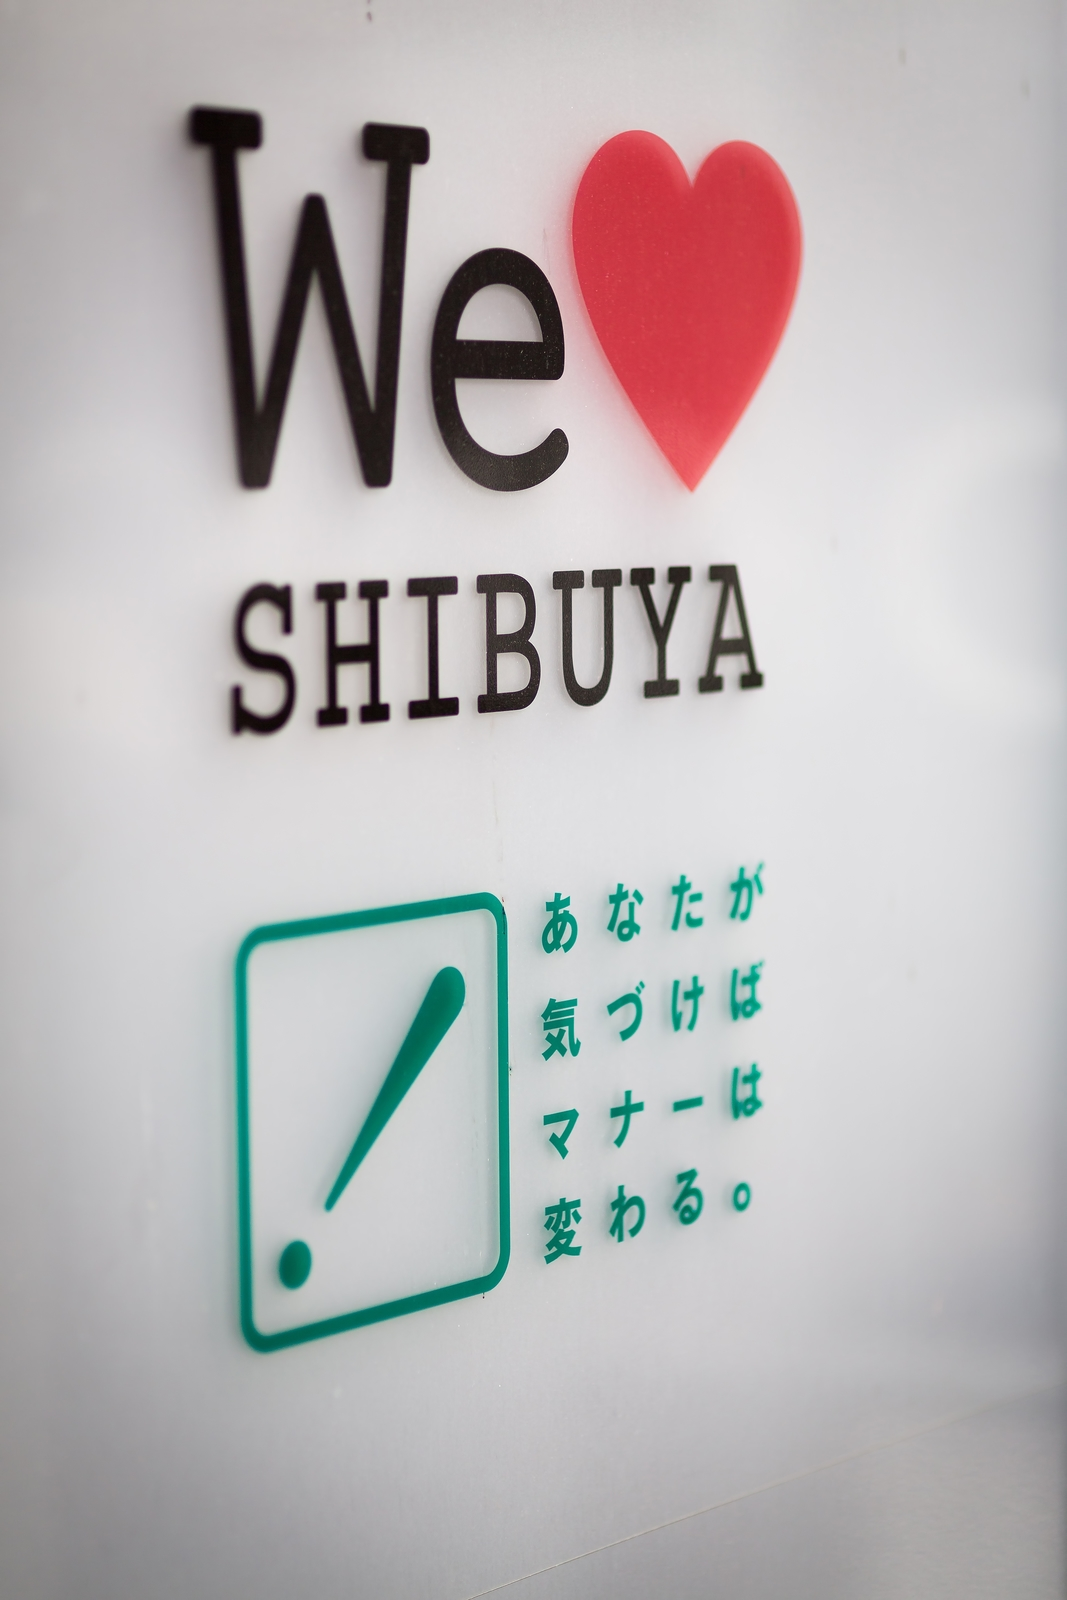 pak89_webloveshibuya-thumb-autox1600-16153